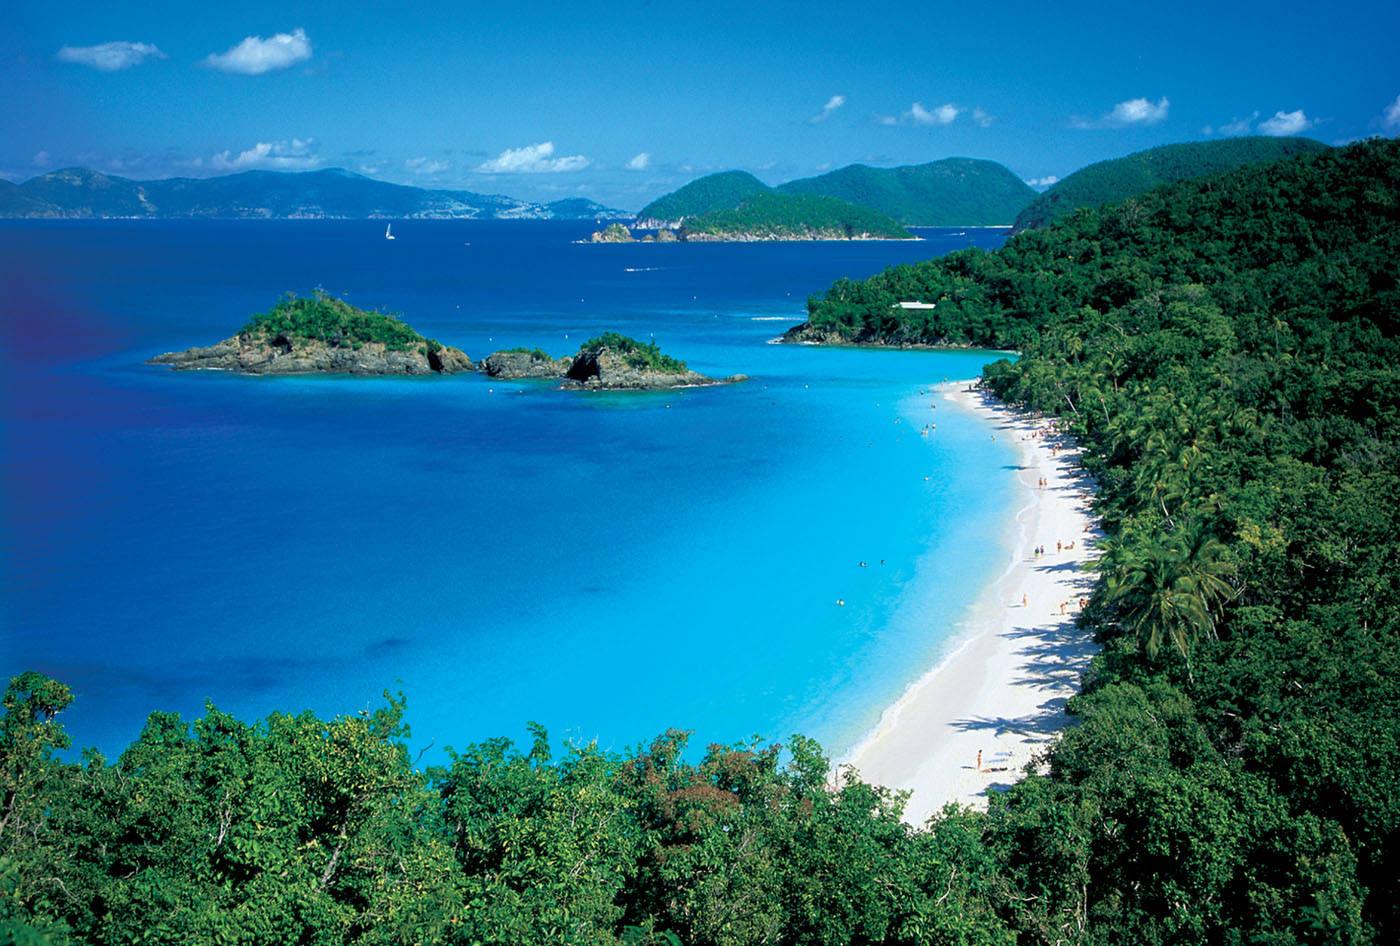 US Virgin Islands Pictures - Traveler Photos of US